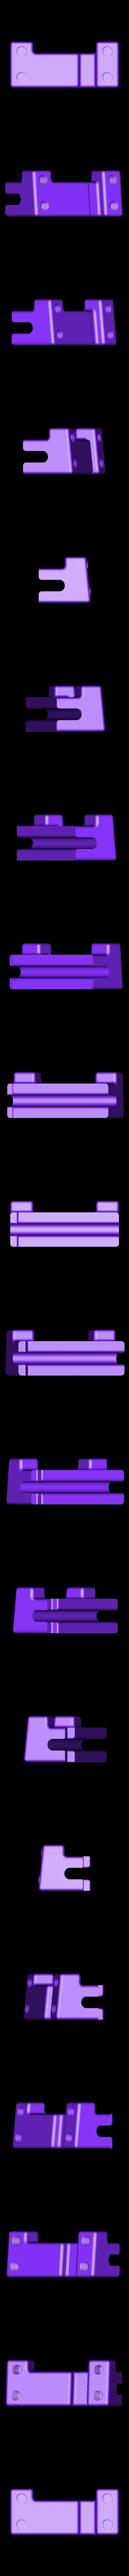 Final_Nano_Bulkhead.stl Descargar archivo STL Ritewing Nano Drak Print Bundle • Objeto imprimible en 3D, RobsLoco